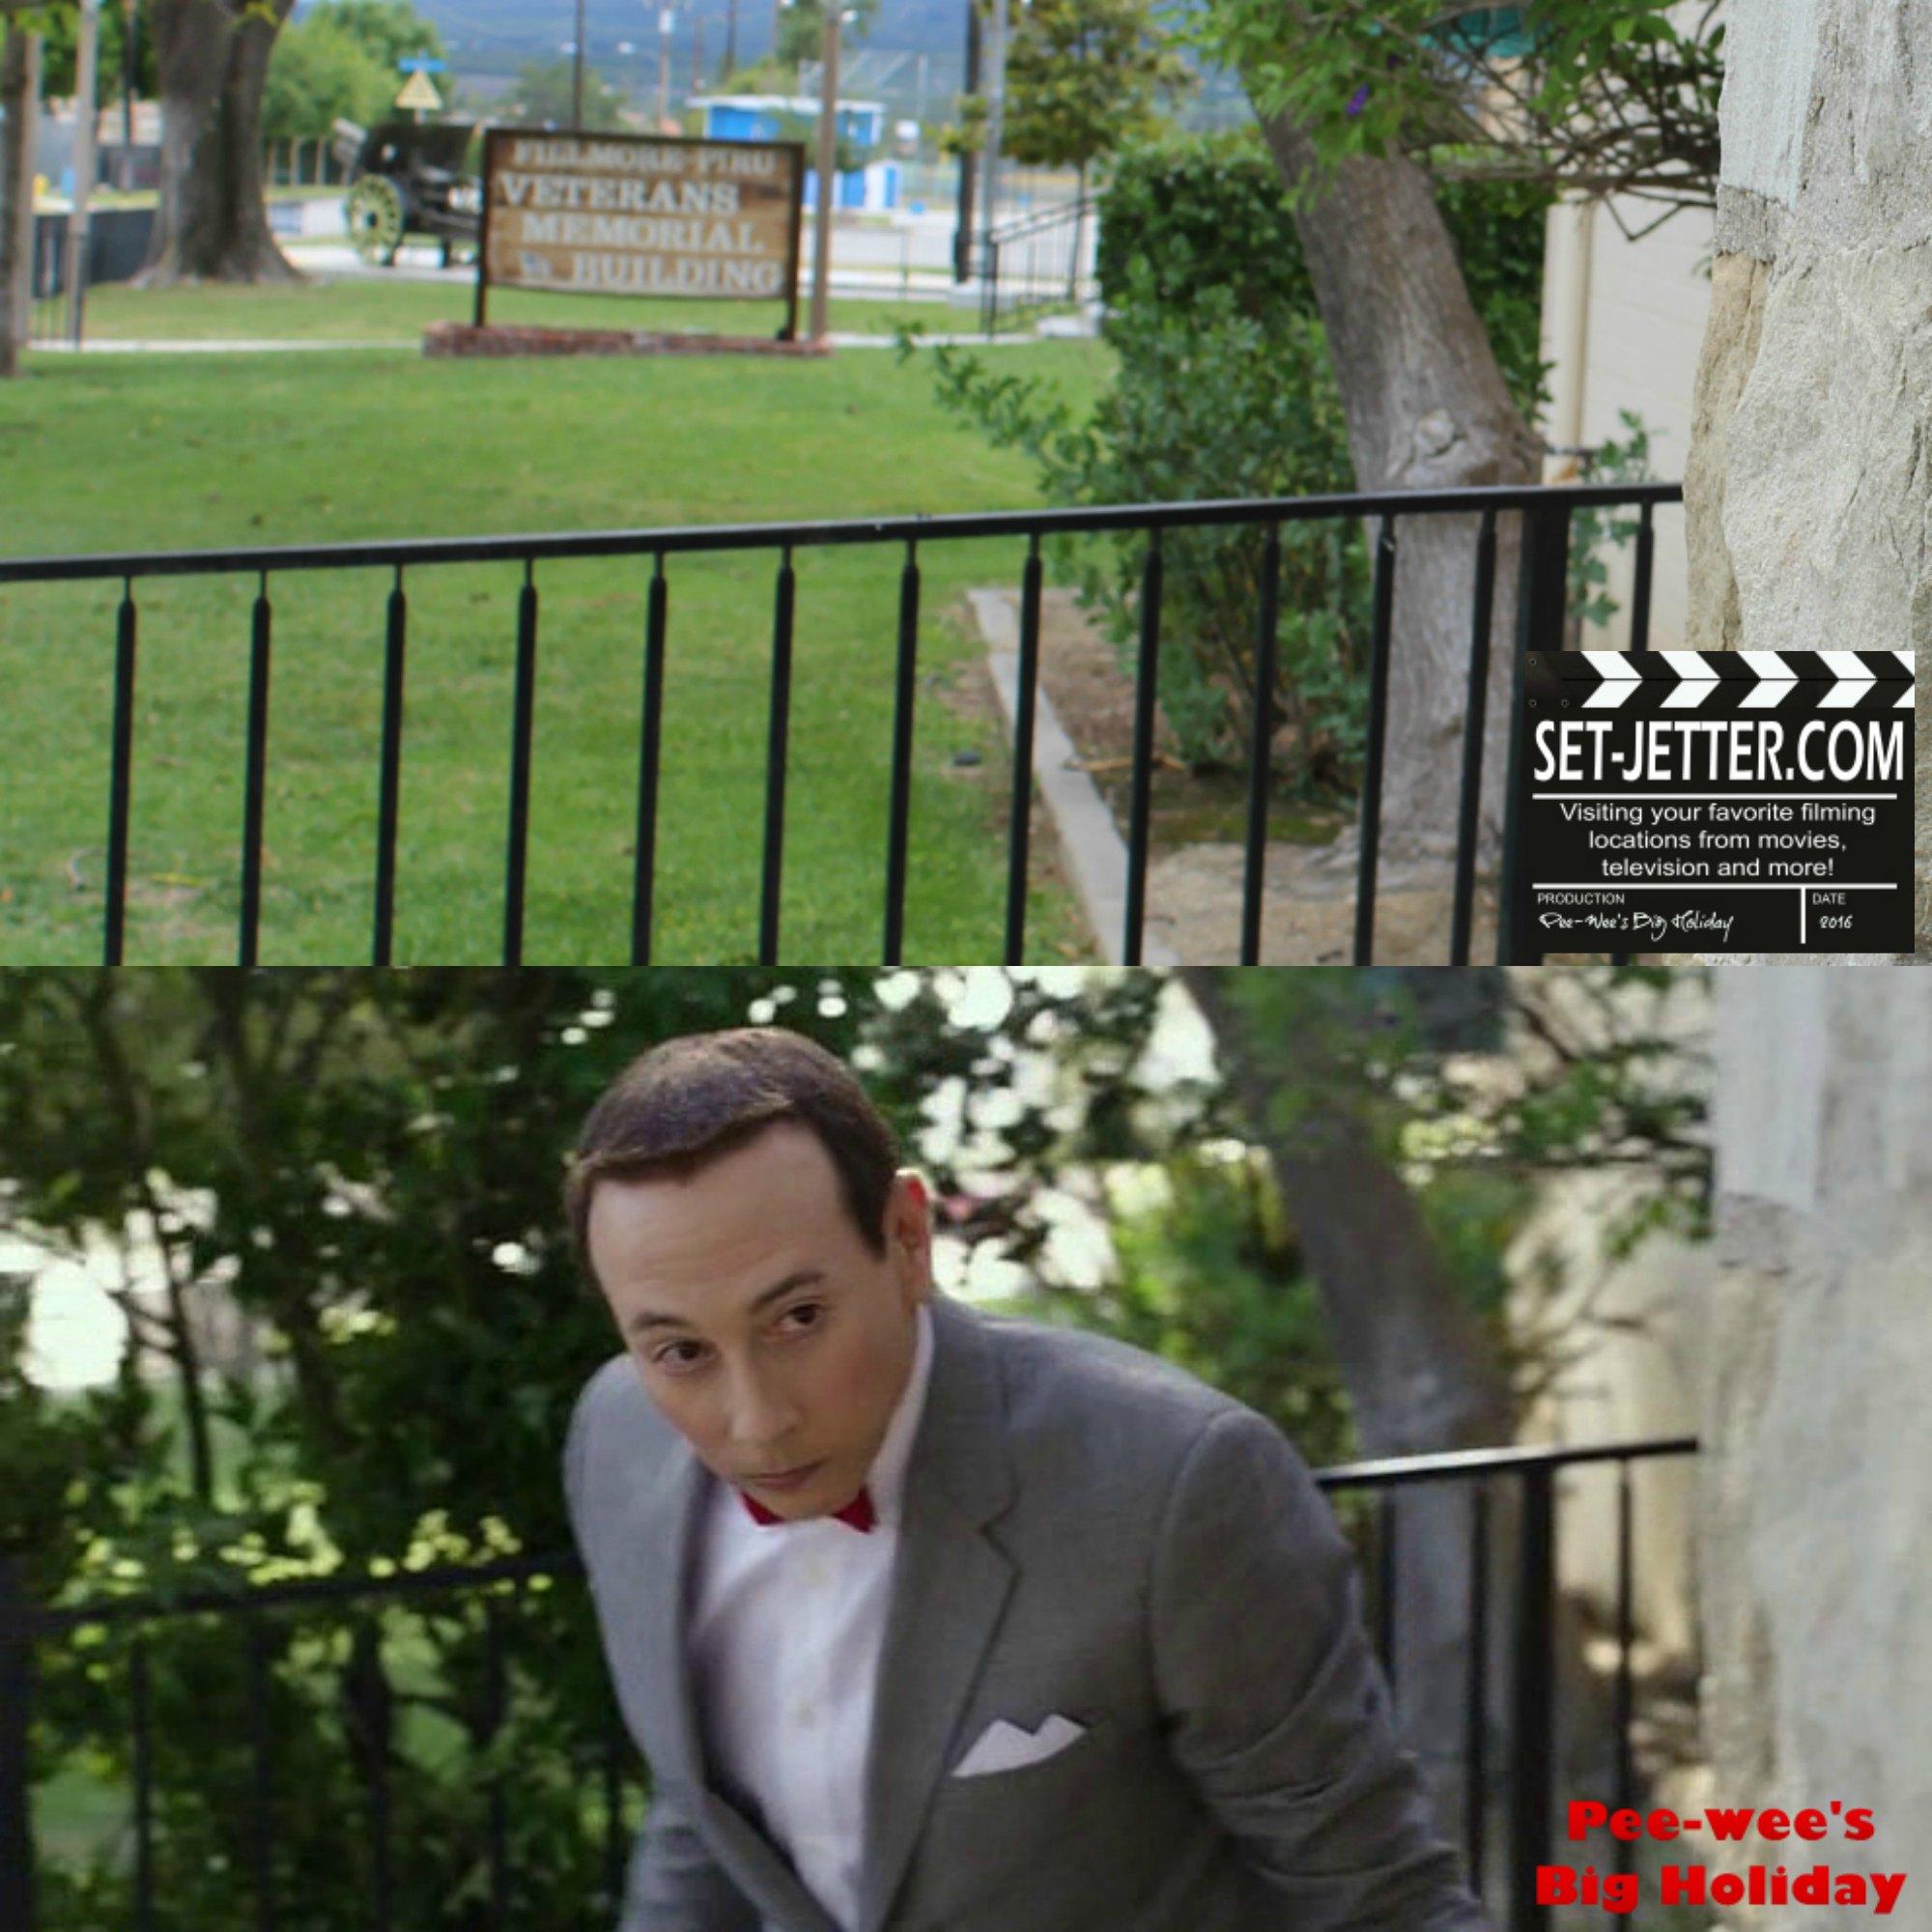 Pee Wee's Big Holiday comparison 270.jpg